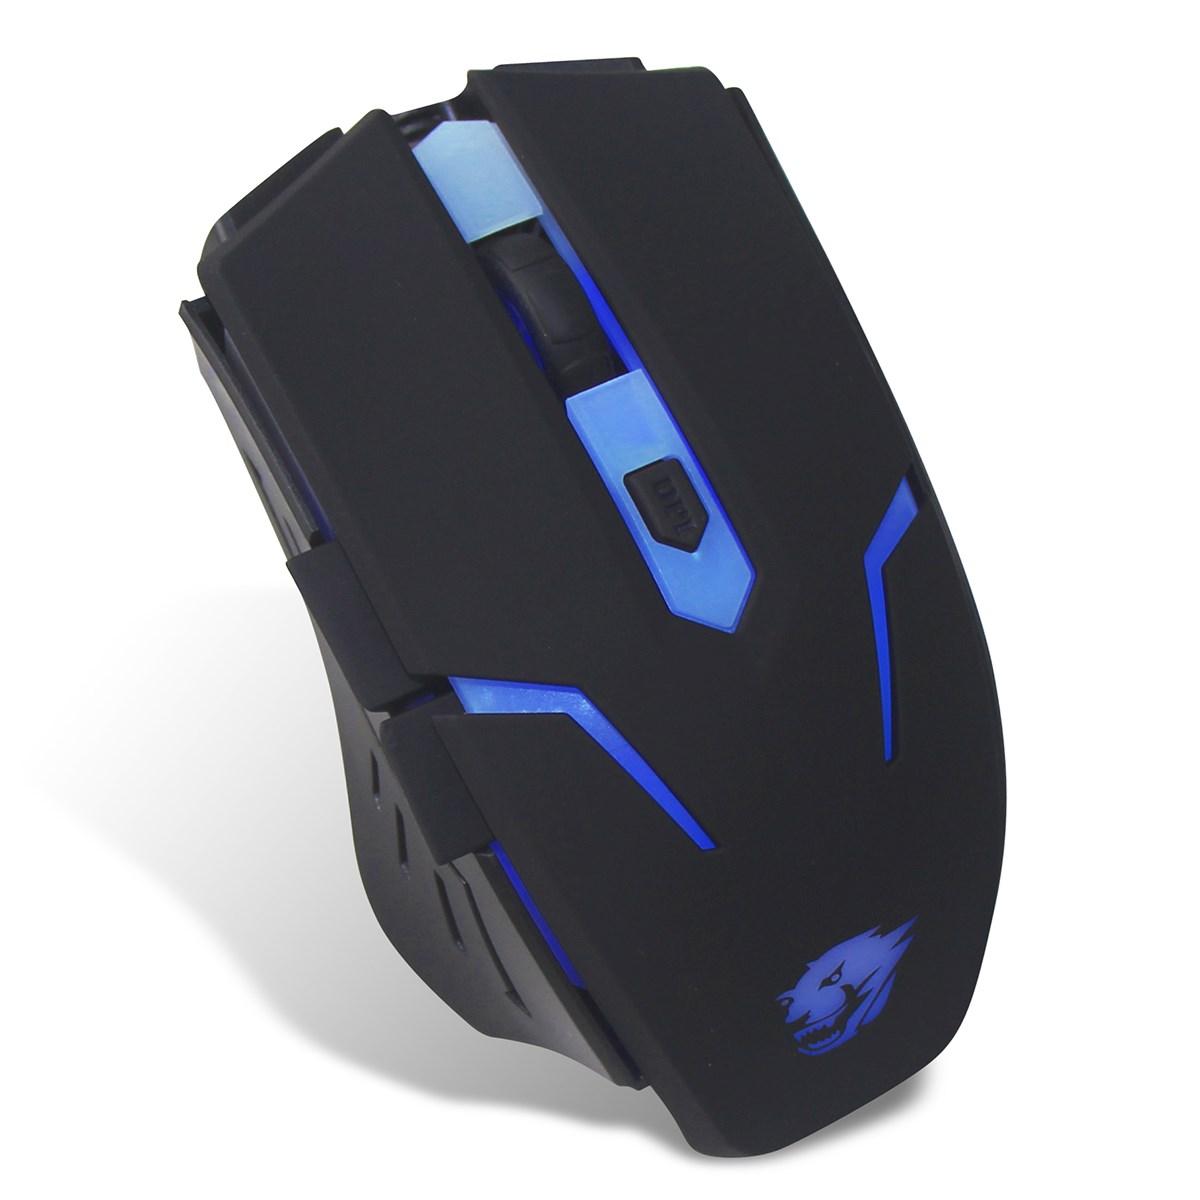 Powercool Usb Gaming Mouse With Blue Led Illumination 1 5m